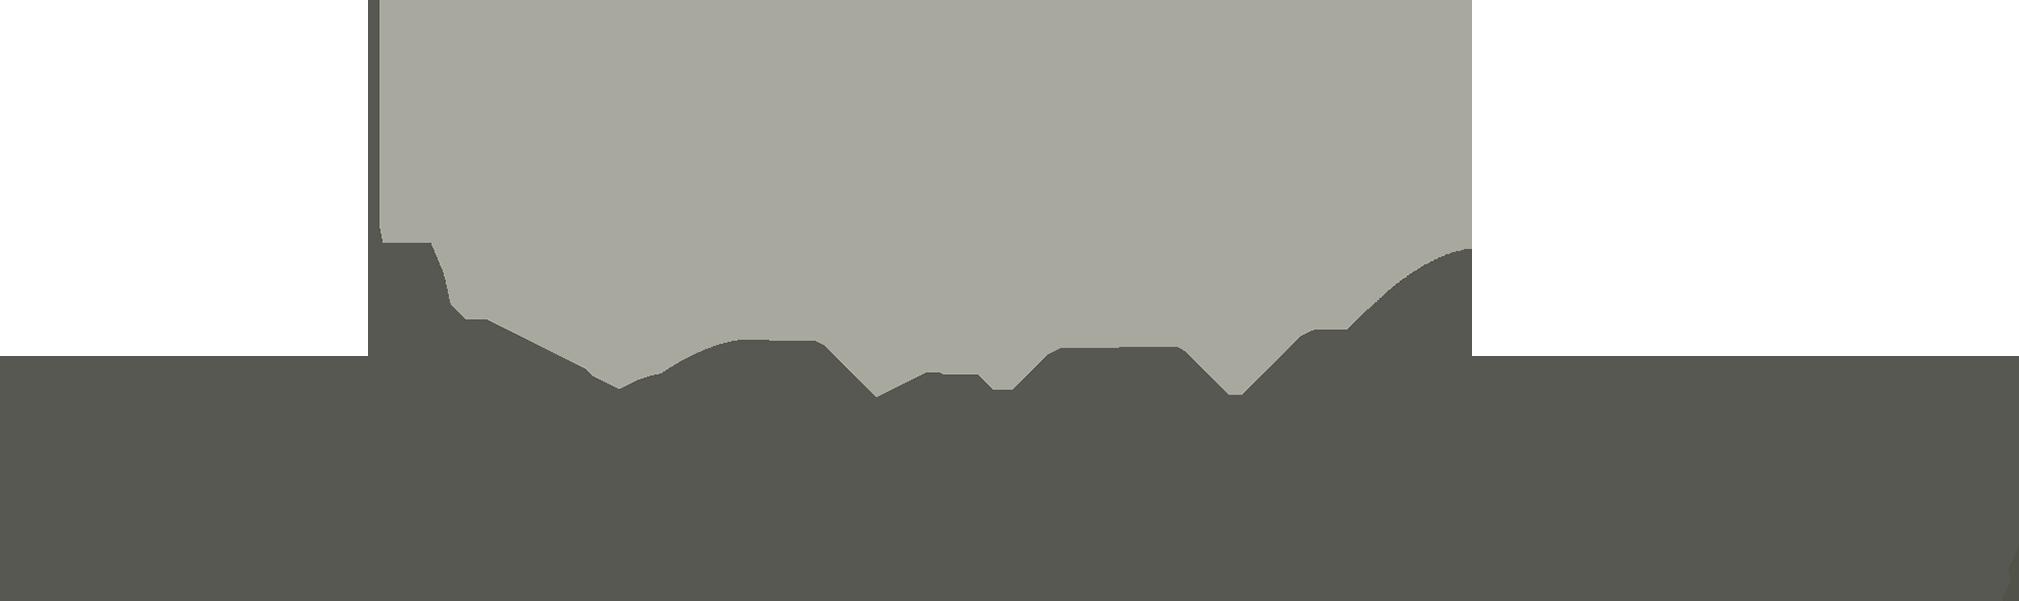 ashton-woods-homes_owler_20171030_211107_original.png